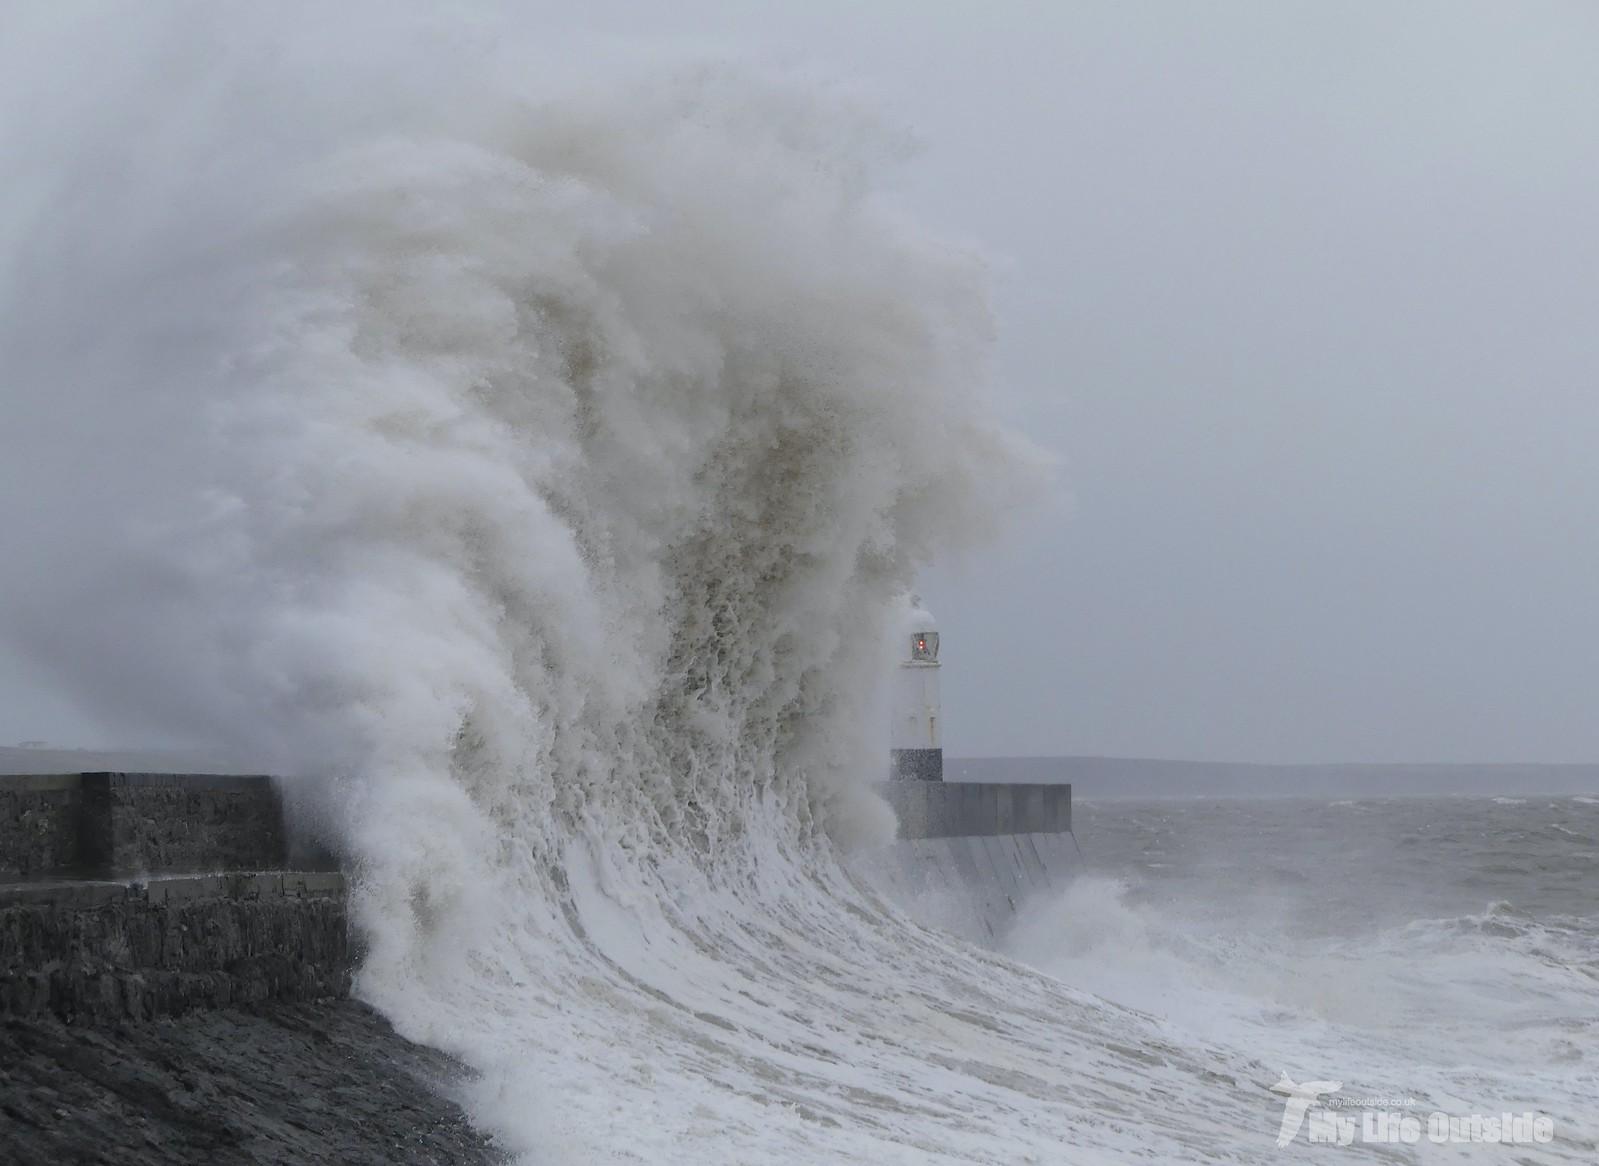 P1230395 - Storm Dennis, Porthcawl